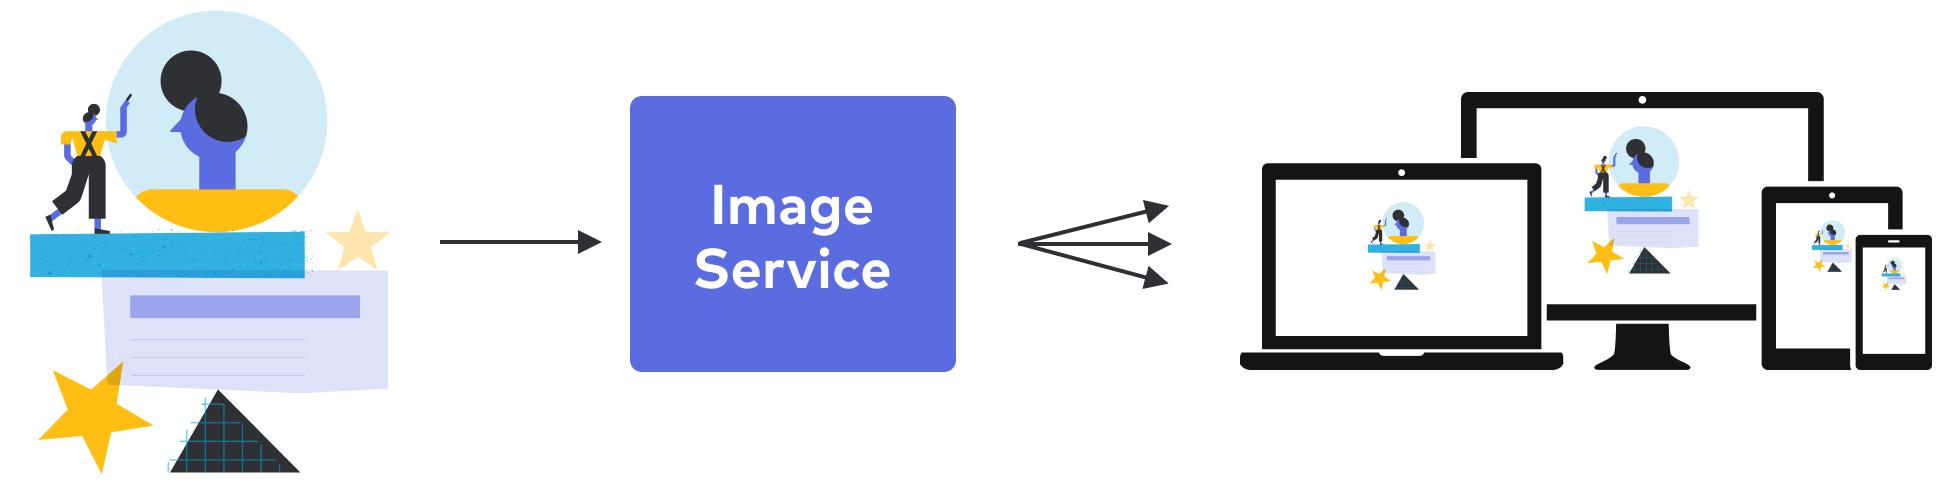 thumbprint-image-service-horiz